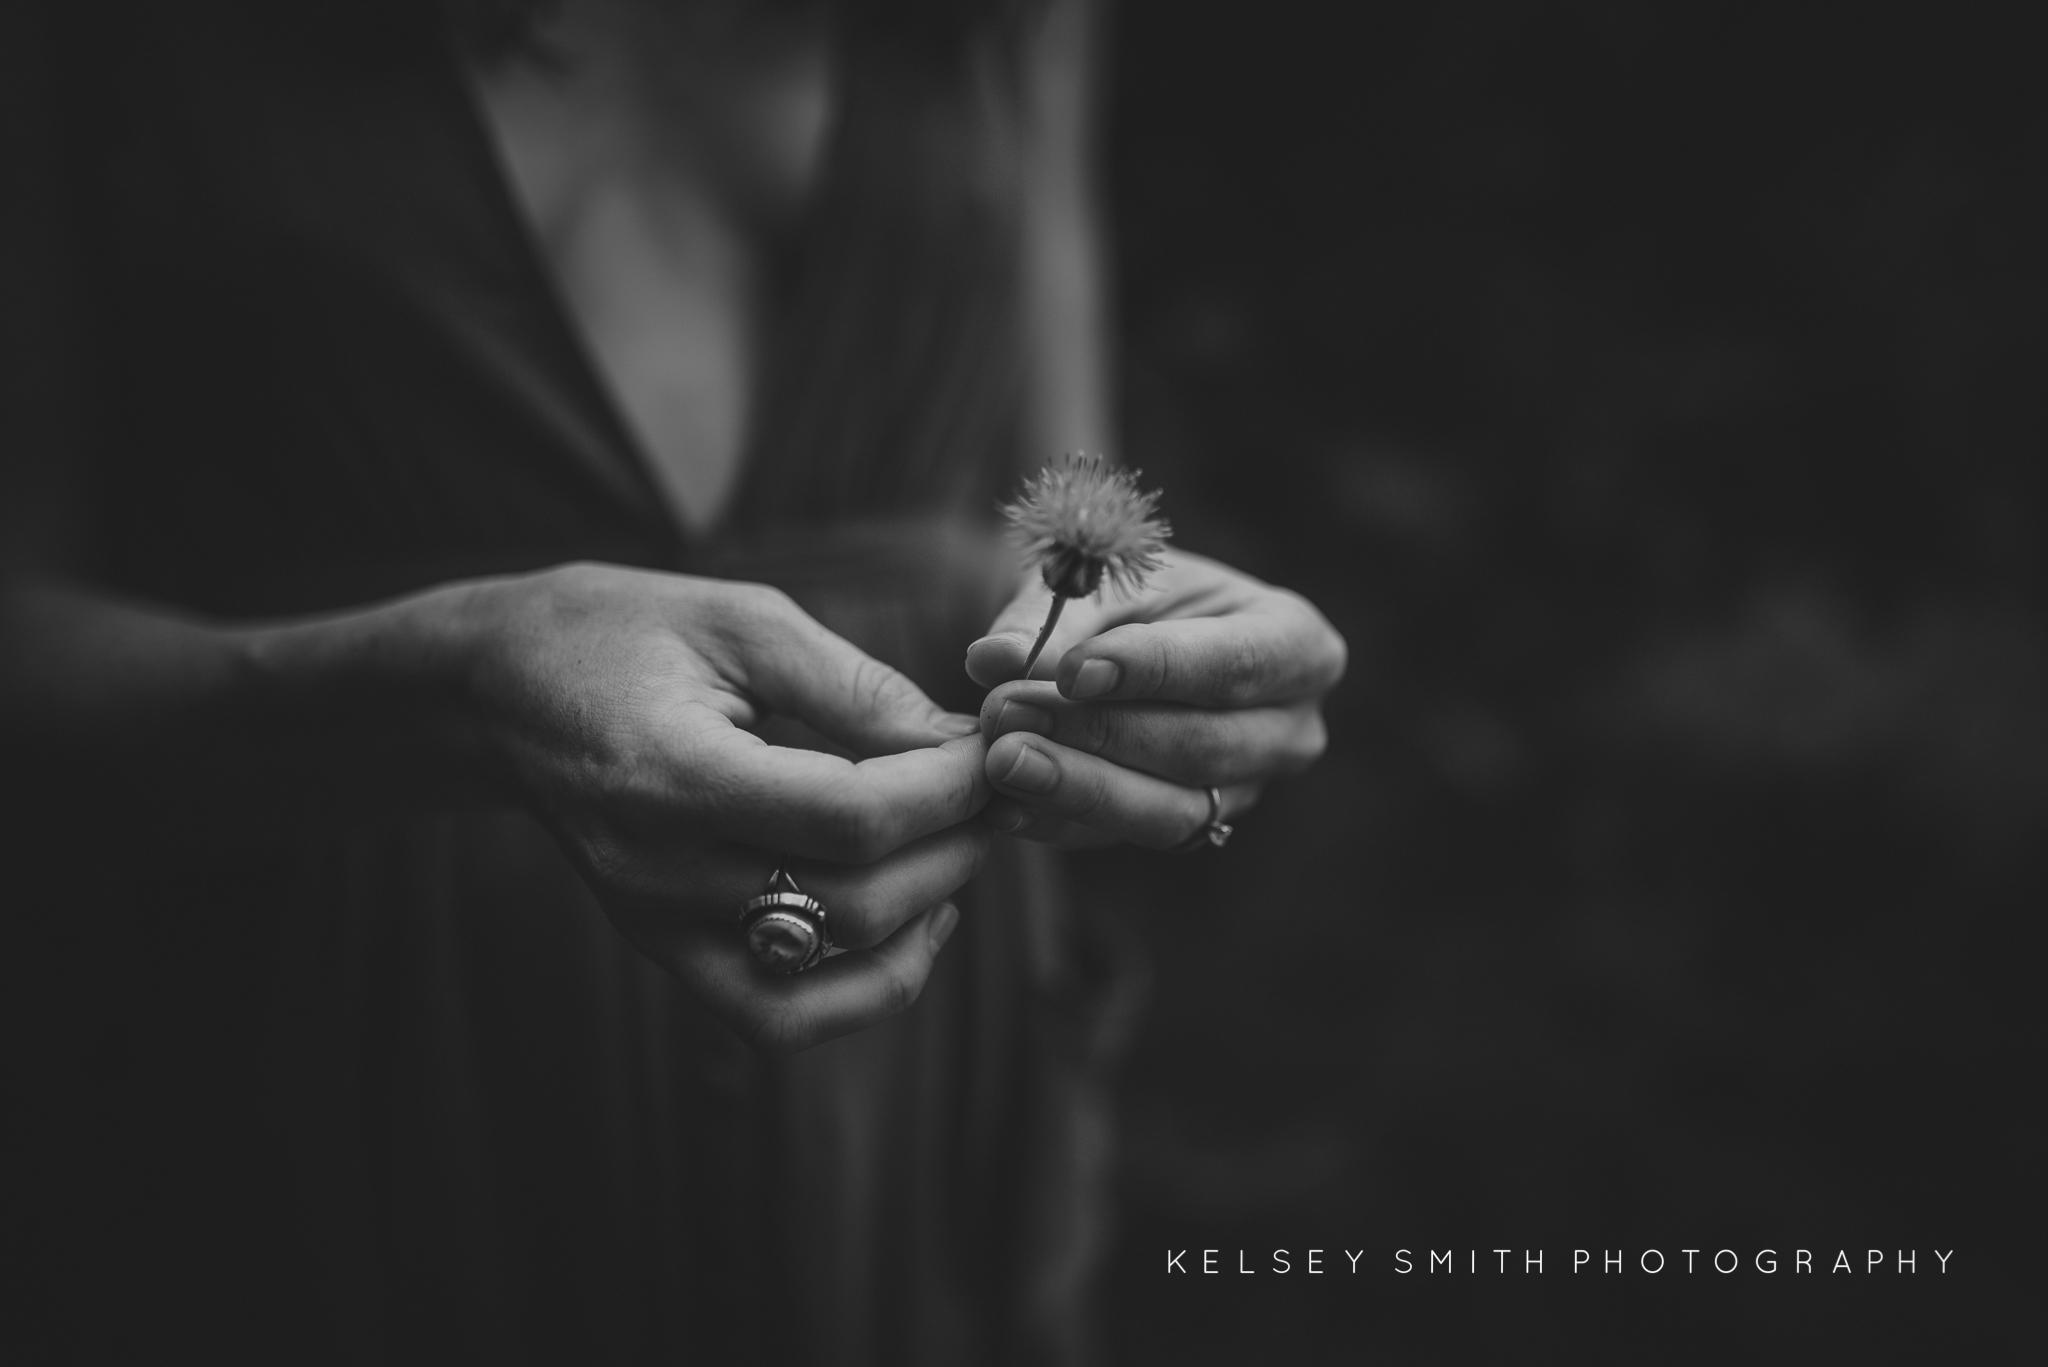 TheDeadTreeSociety_KelseySmithPhotography (Web Resolution)-3.jpg